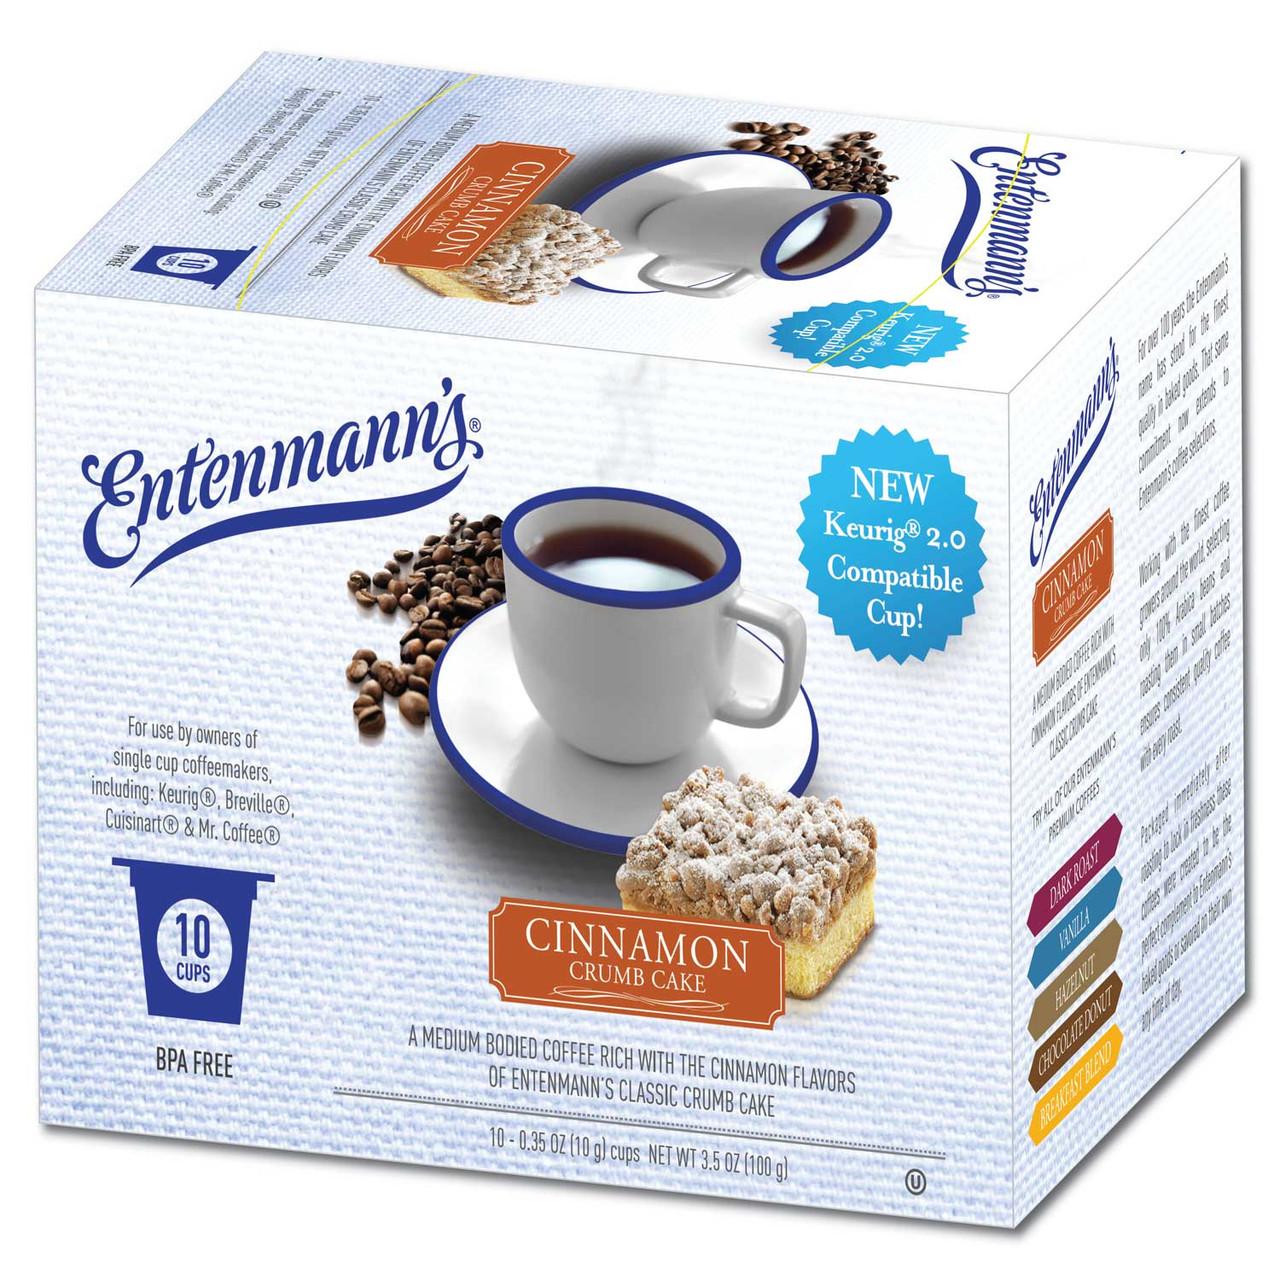 Cinnamon Crumb Cake Flavored Coffee by Entenmann's